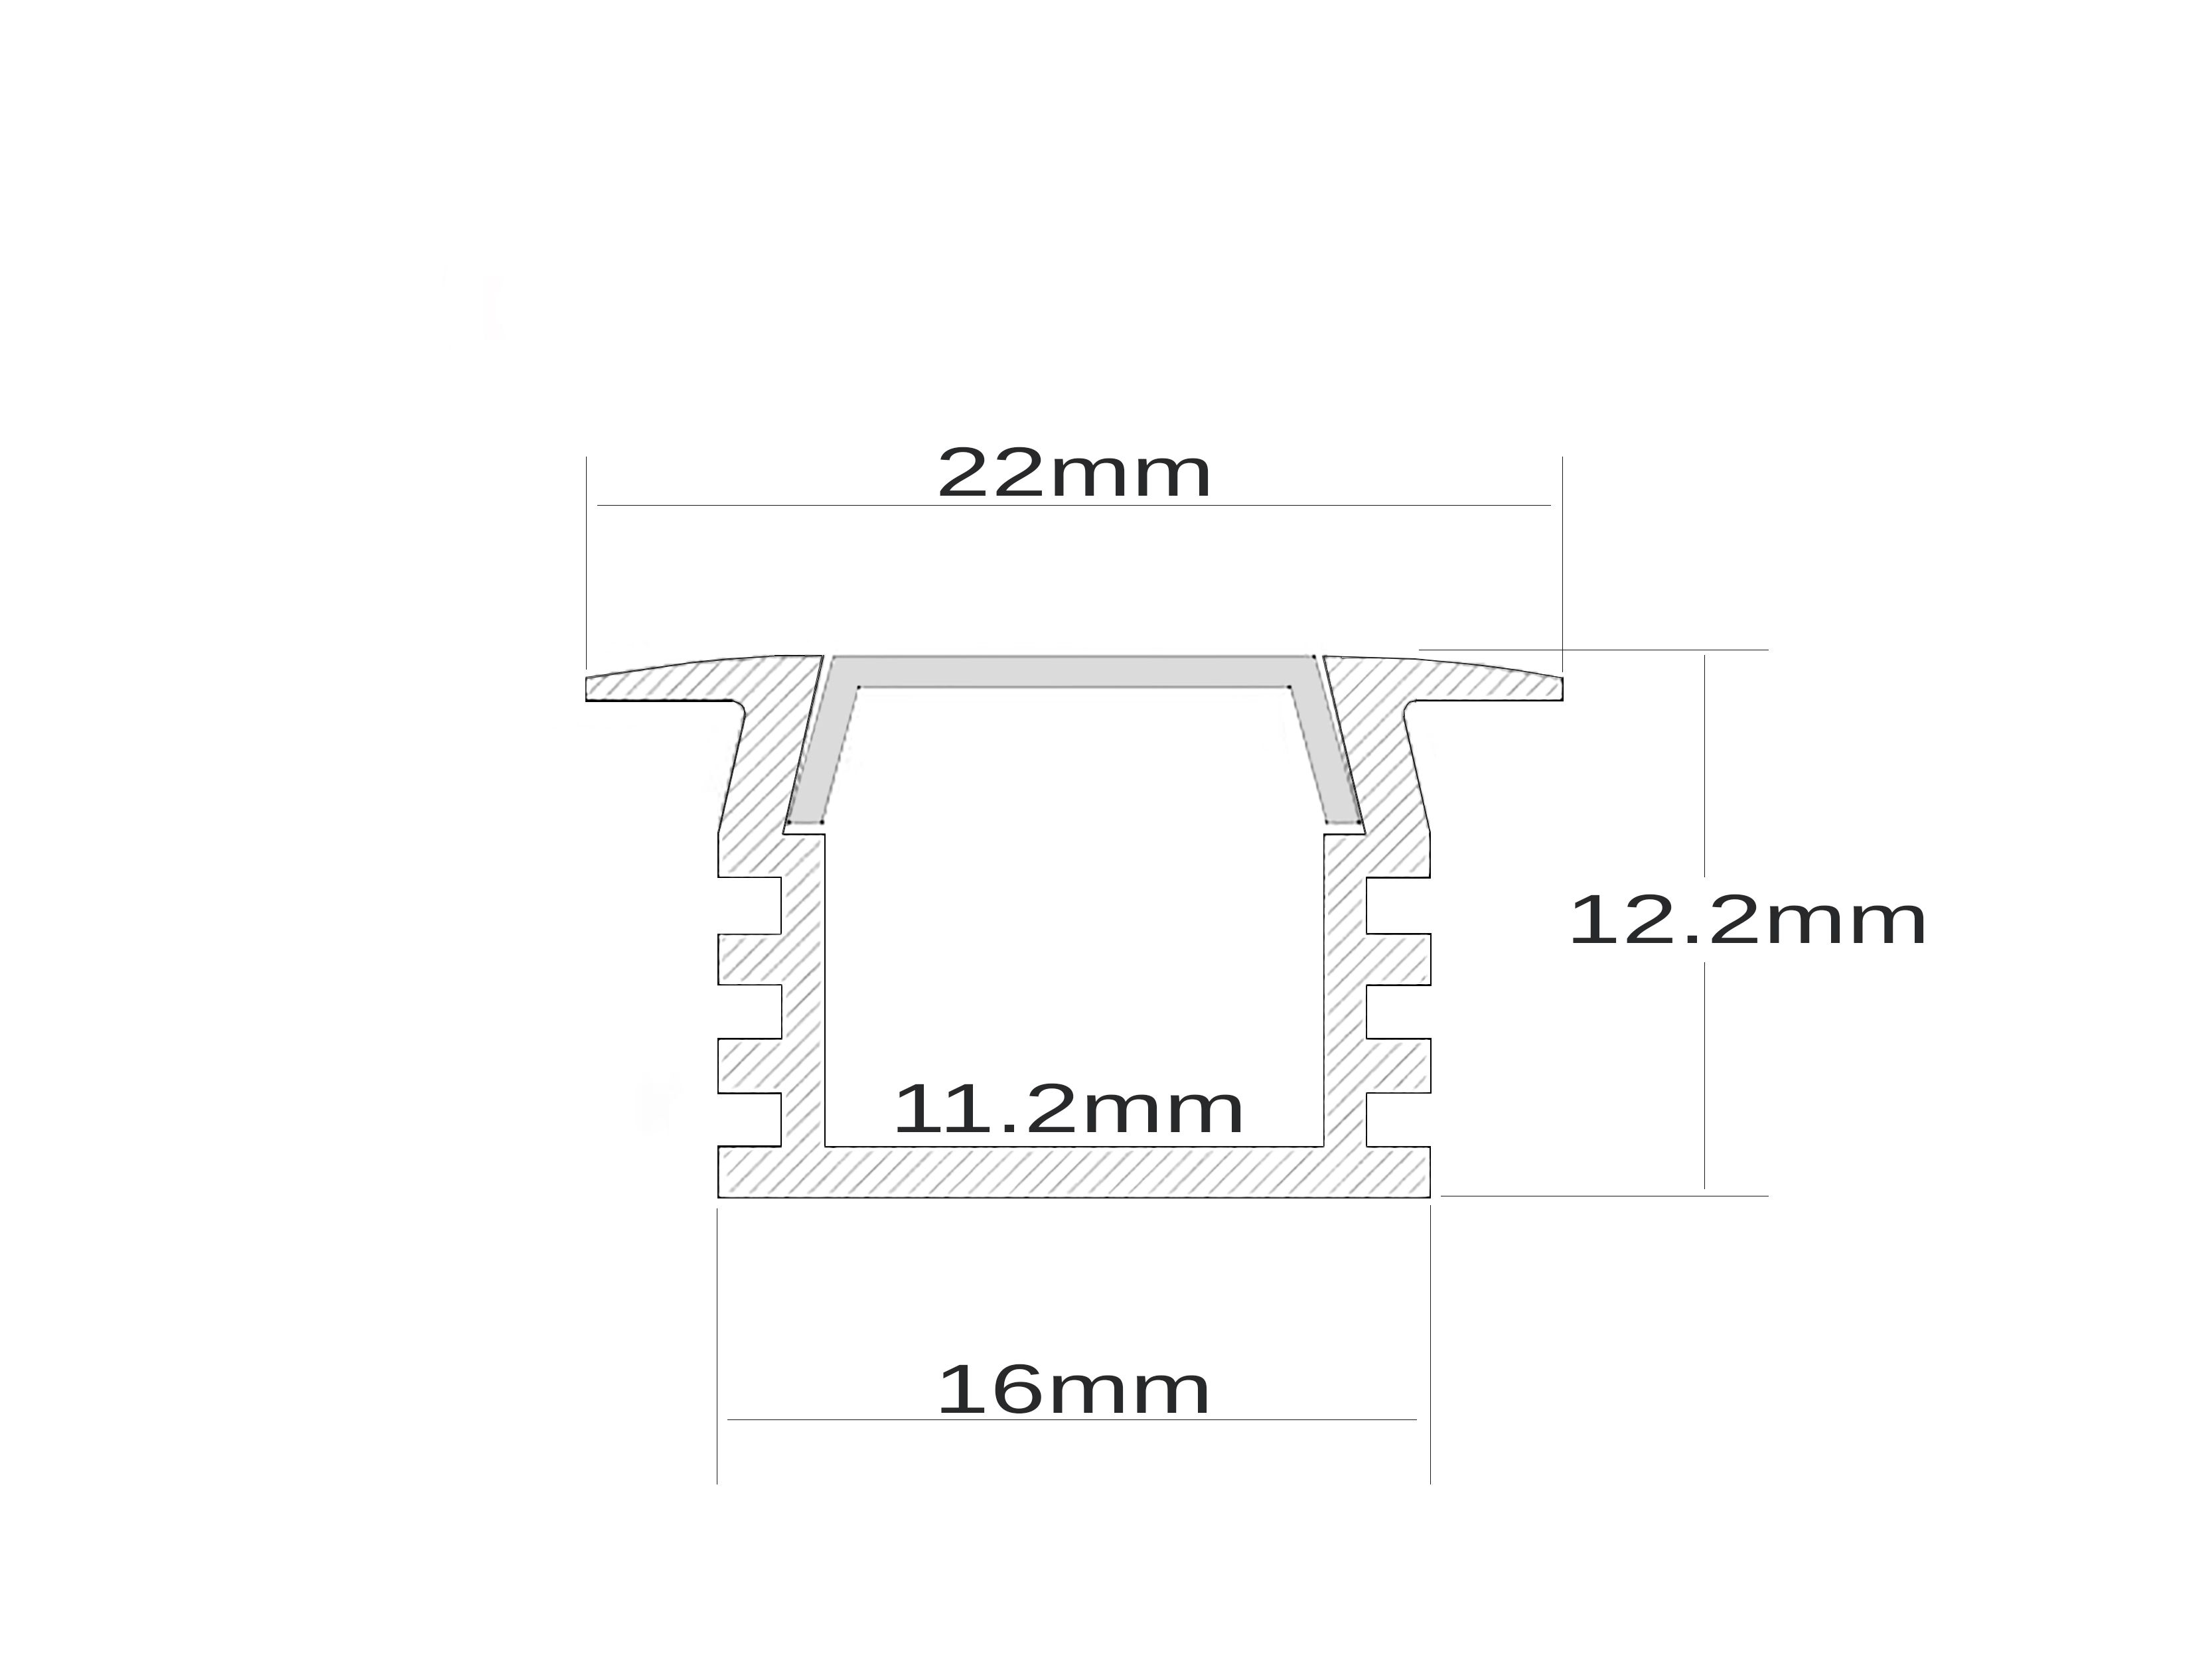 lightline-mini-square-f-4-mj-lighting-v2